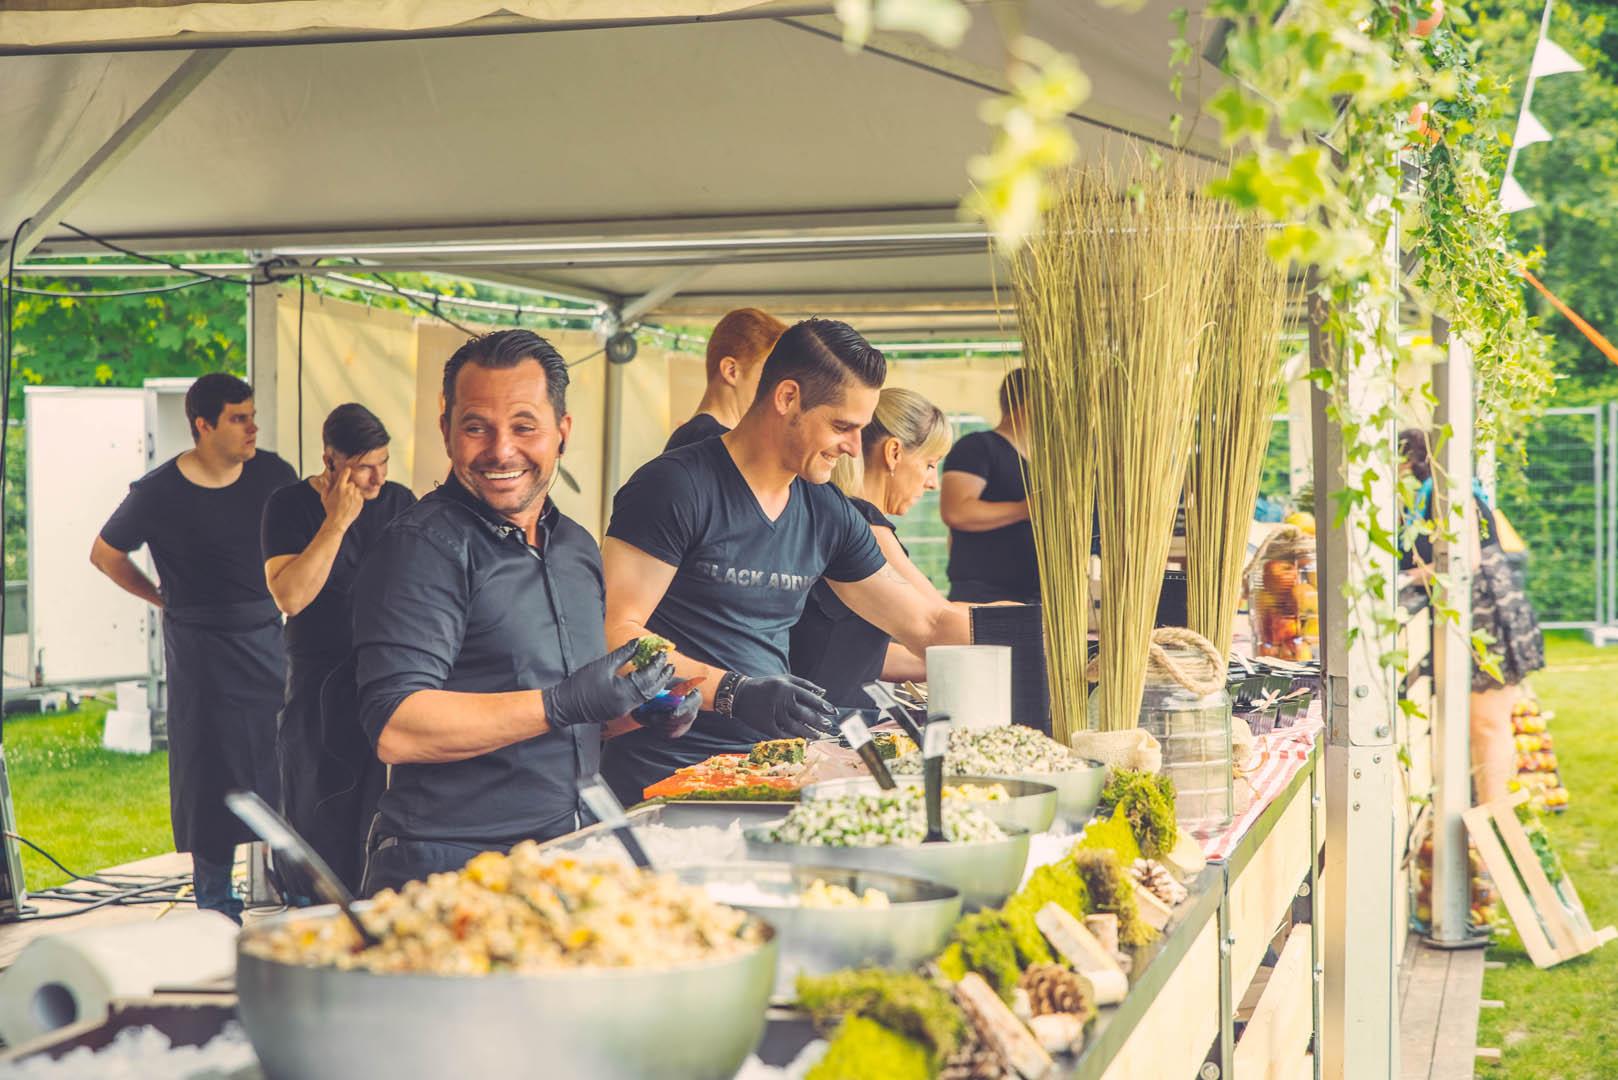 Stad Gent Picknick Event Eten